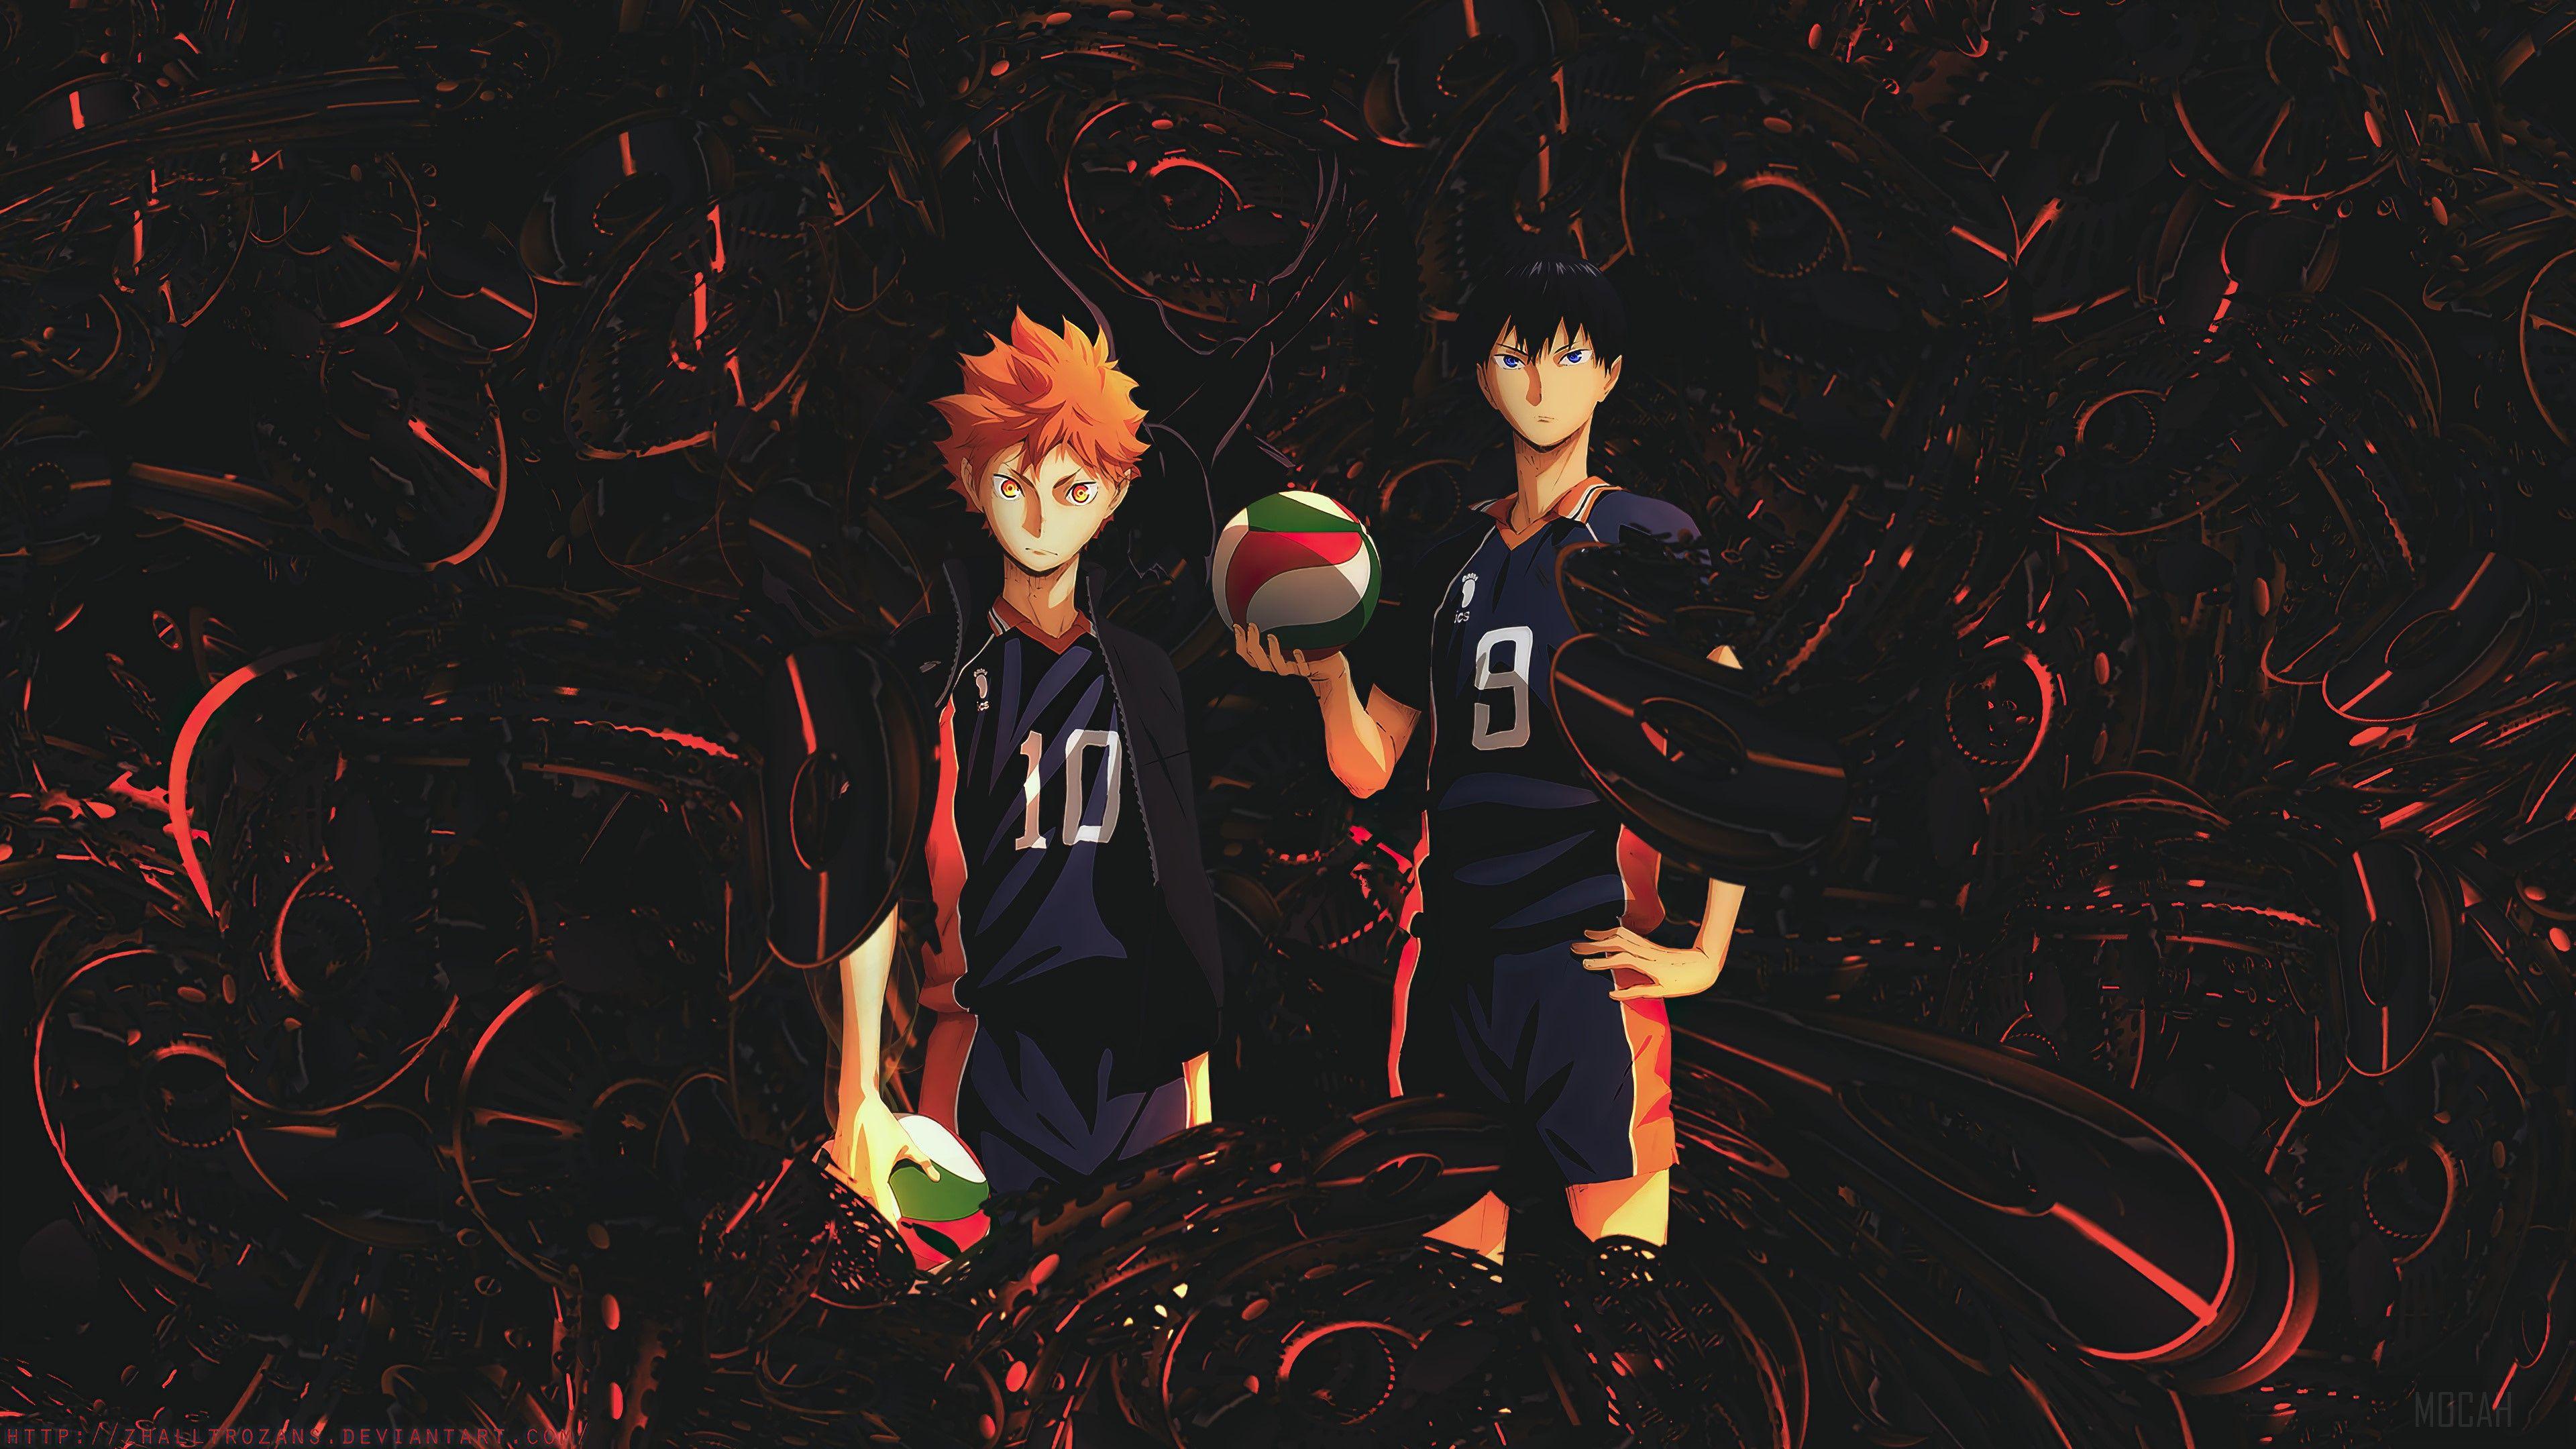 3840x2160 Haikyuu, Anime, Shoyo Hinata, Tobio Kageyama hình nền 4k